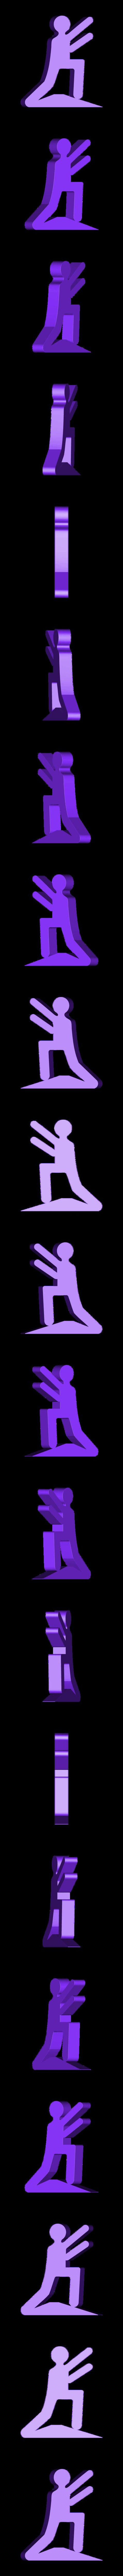 empujando_2.STL Download free STL file Tinny People doorstop • 3D printing object, imj